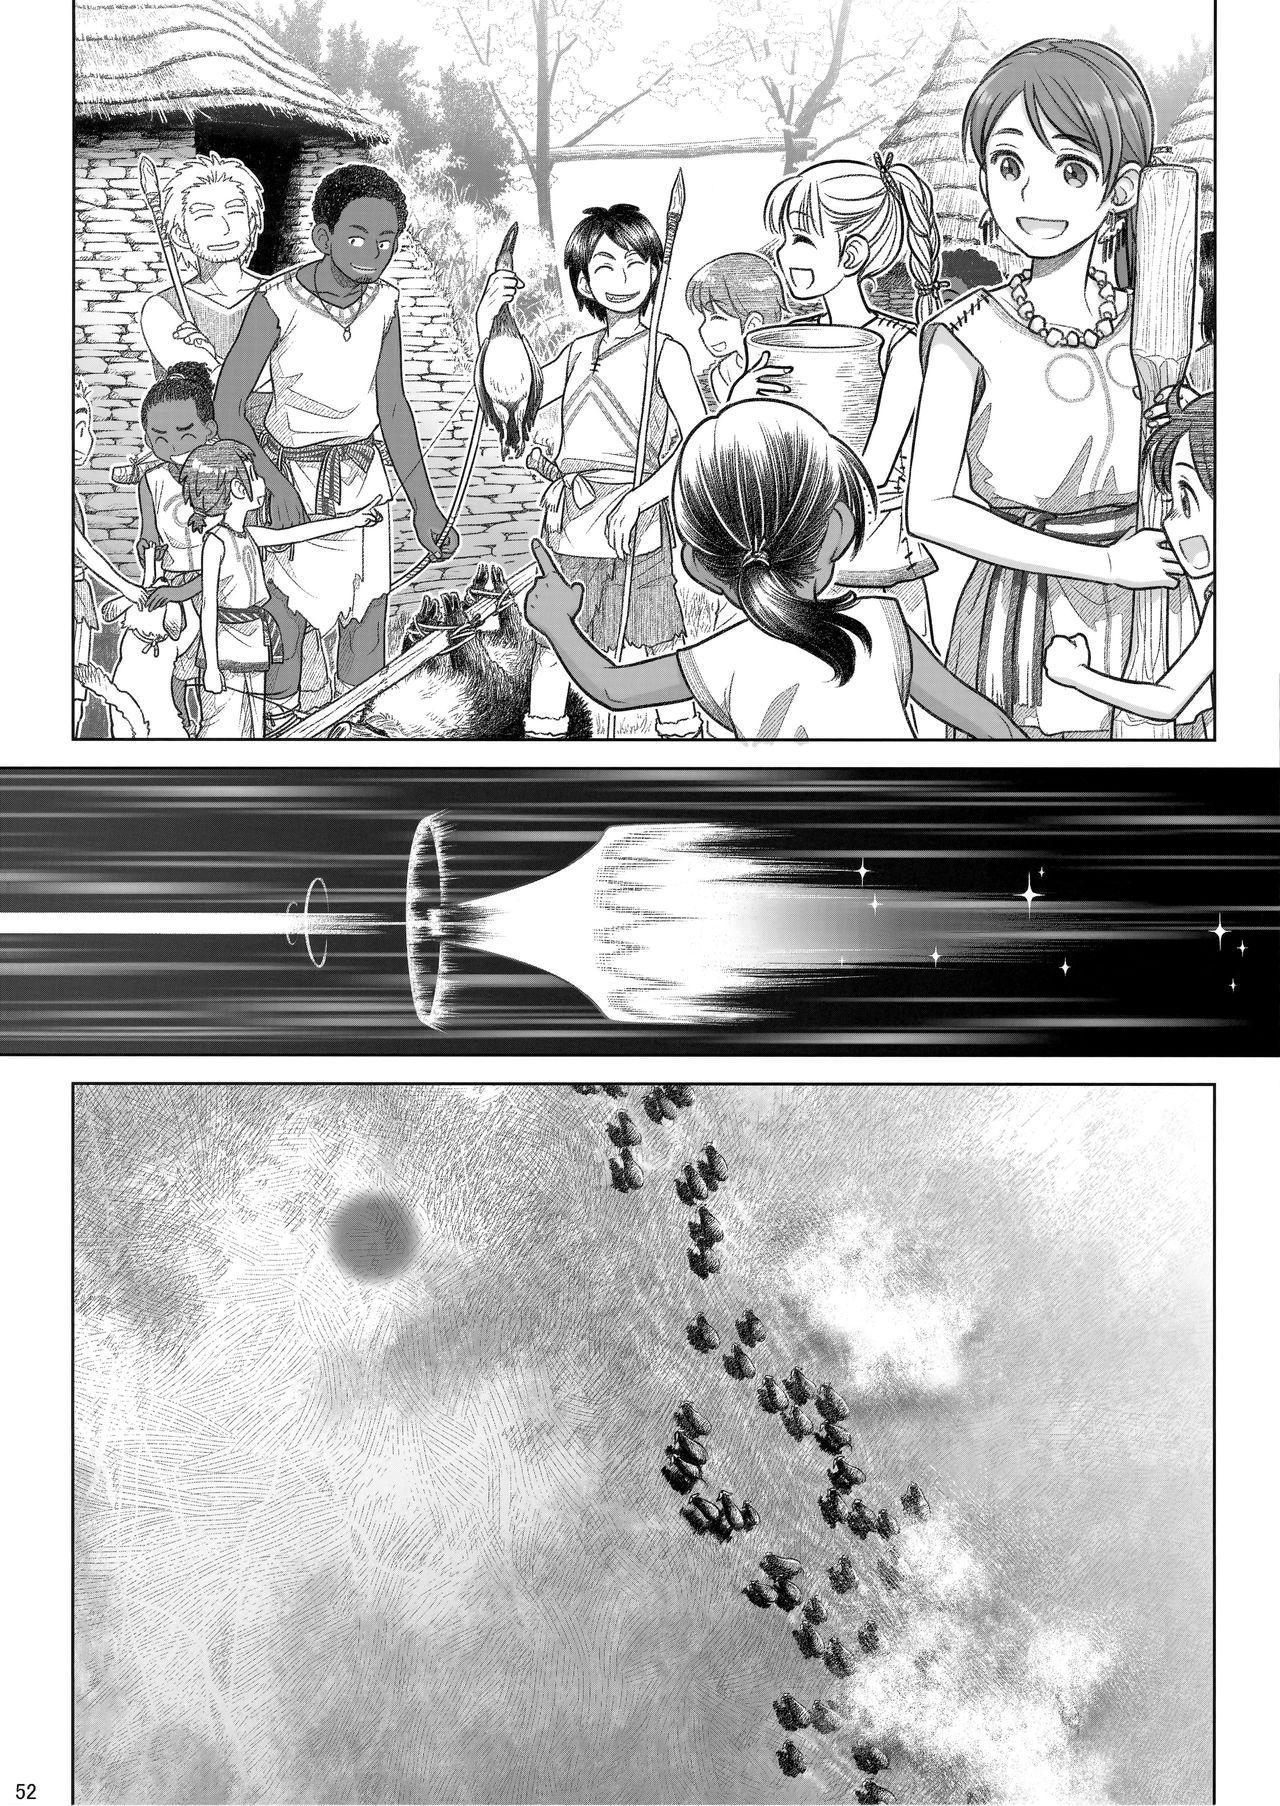 Sorako no Tabi 8 52